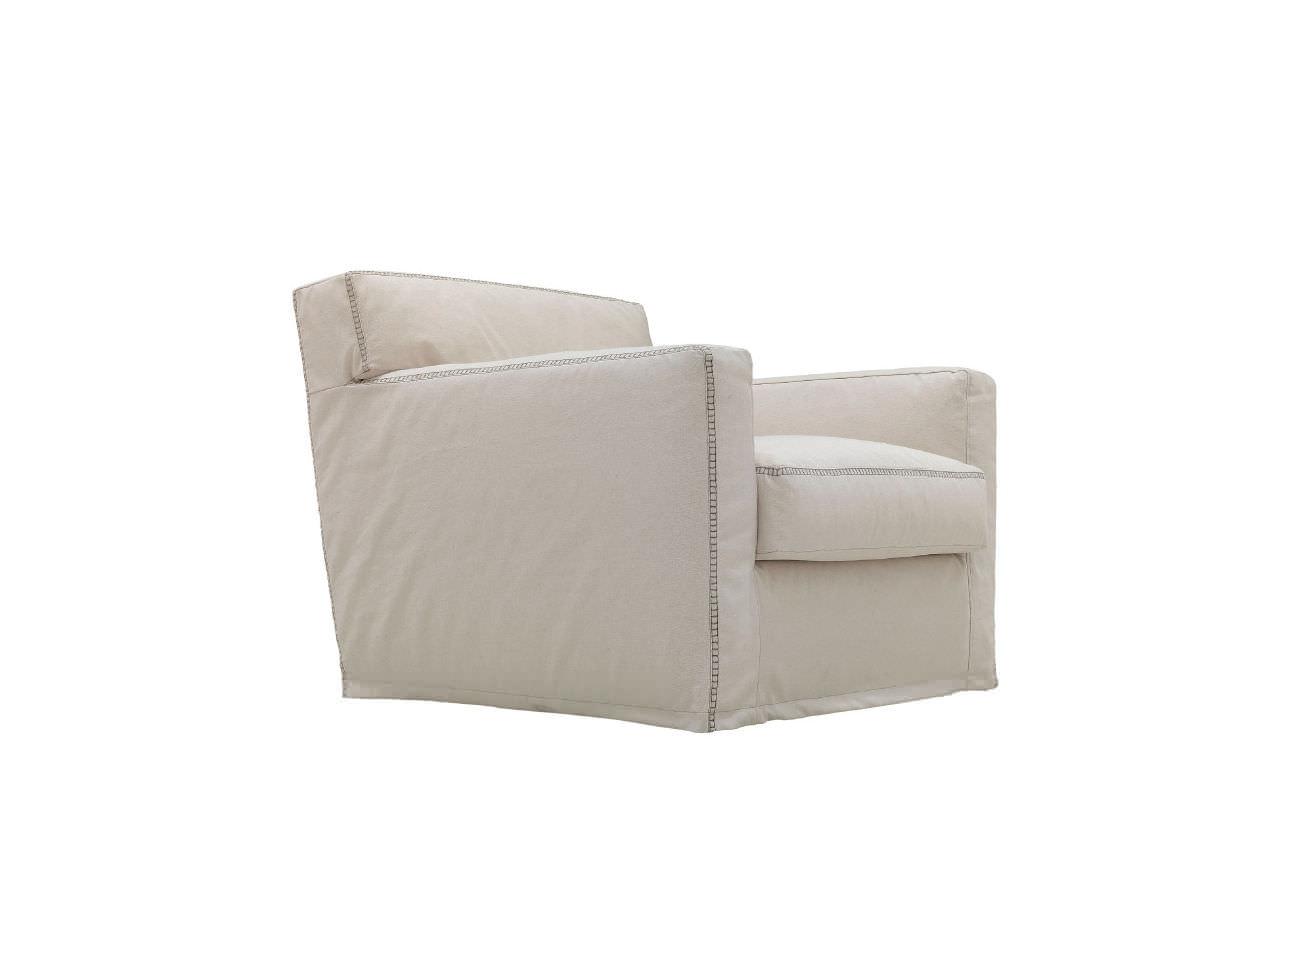 Contemporary armchair   leather HAVANA by Massimiliano Mornati JESSEContemporary armchair   leather   HAVANA by Massimiliano Mornati  . Havana Leather Armchair. Home Design Ideas